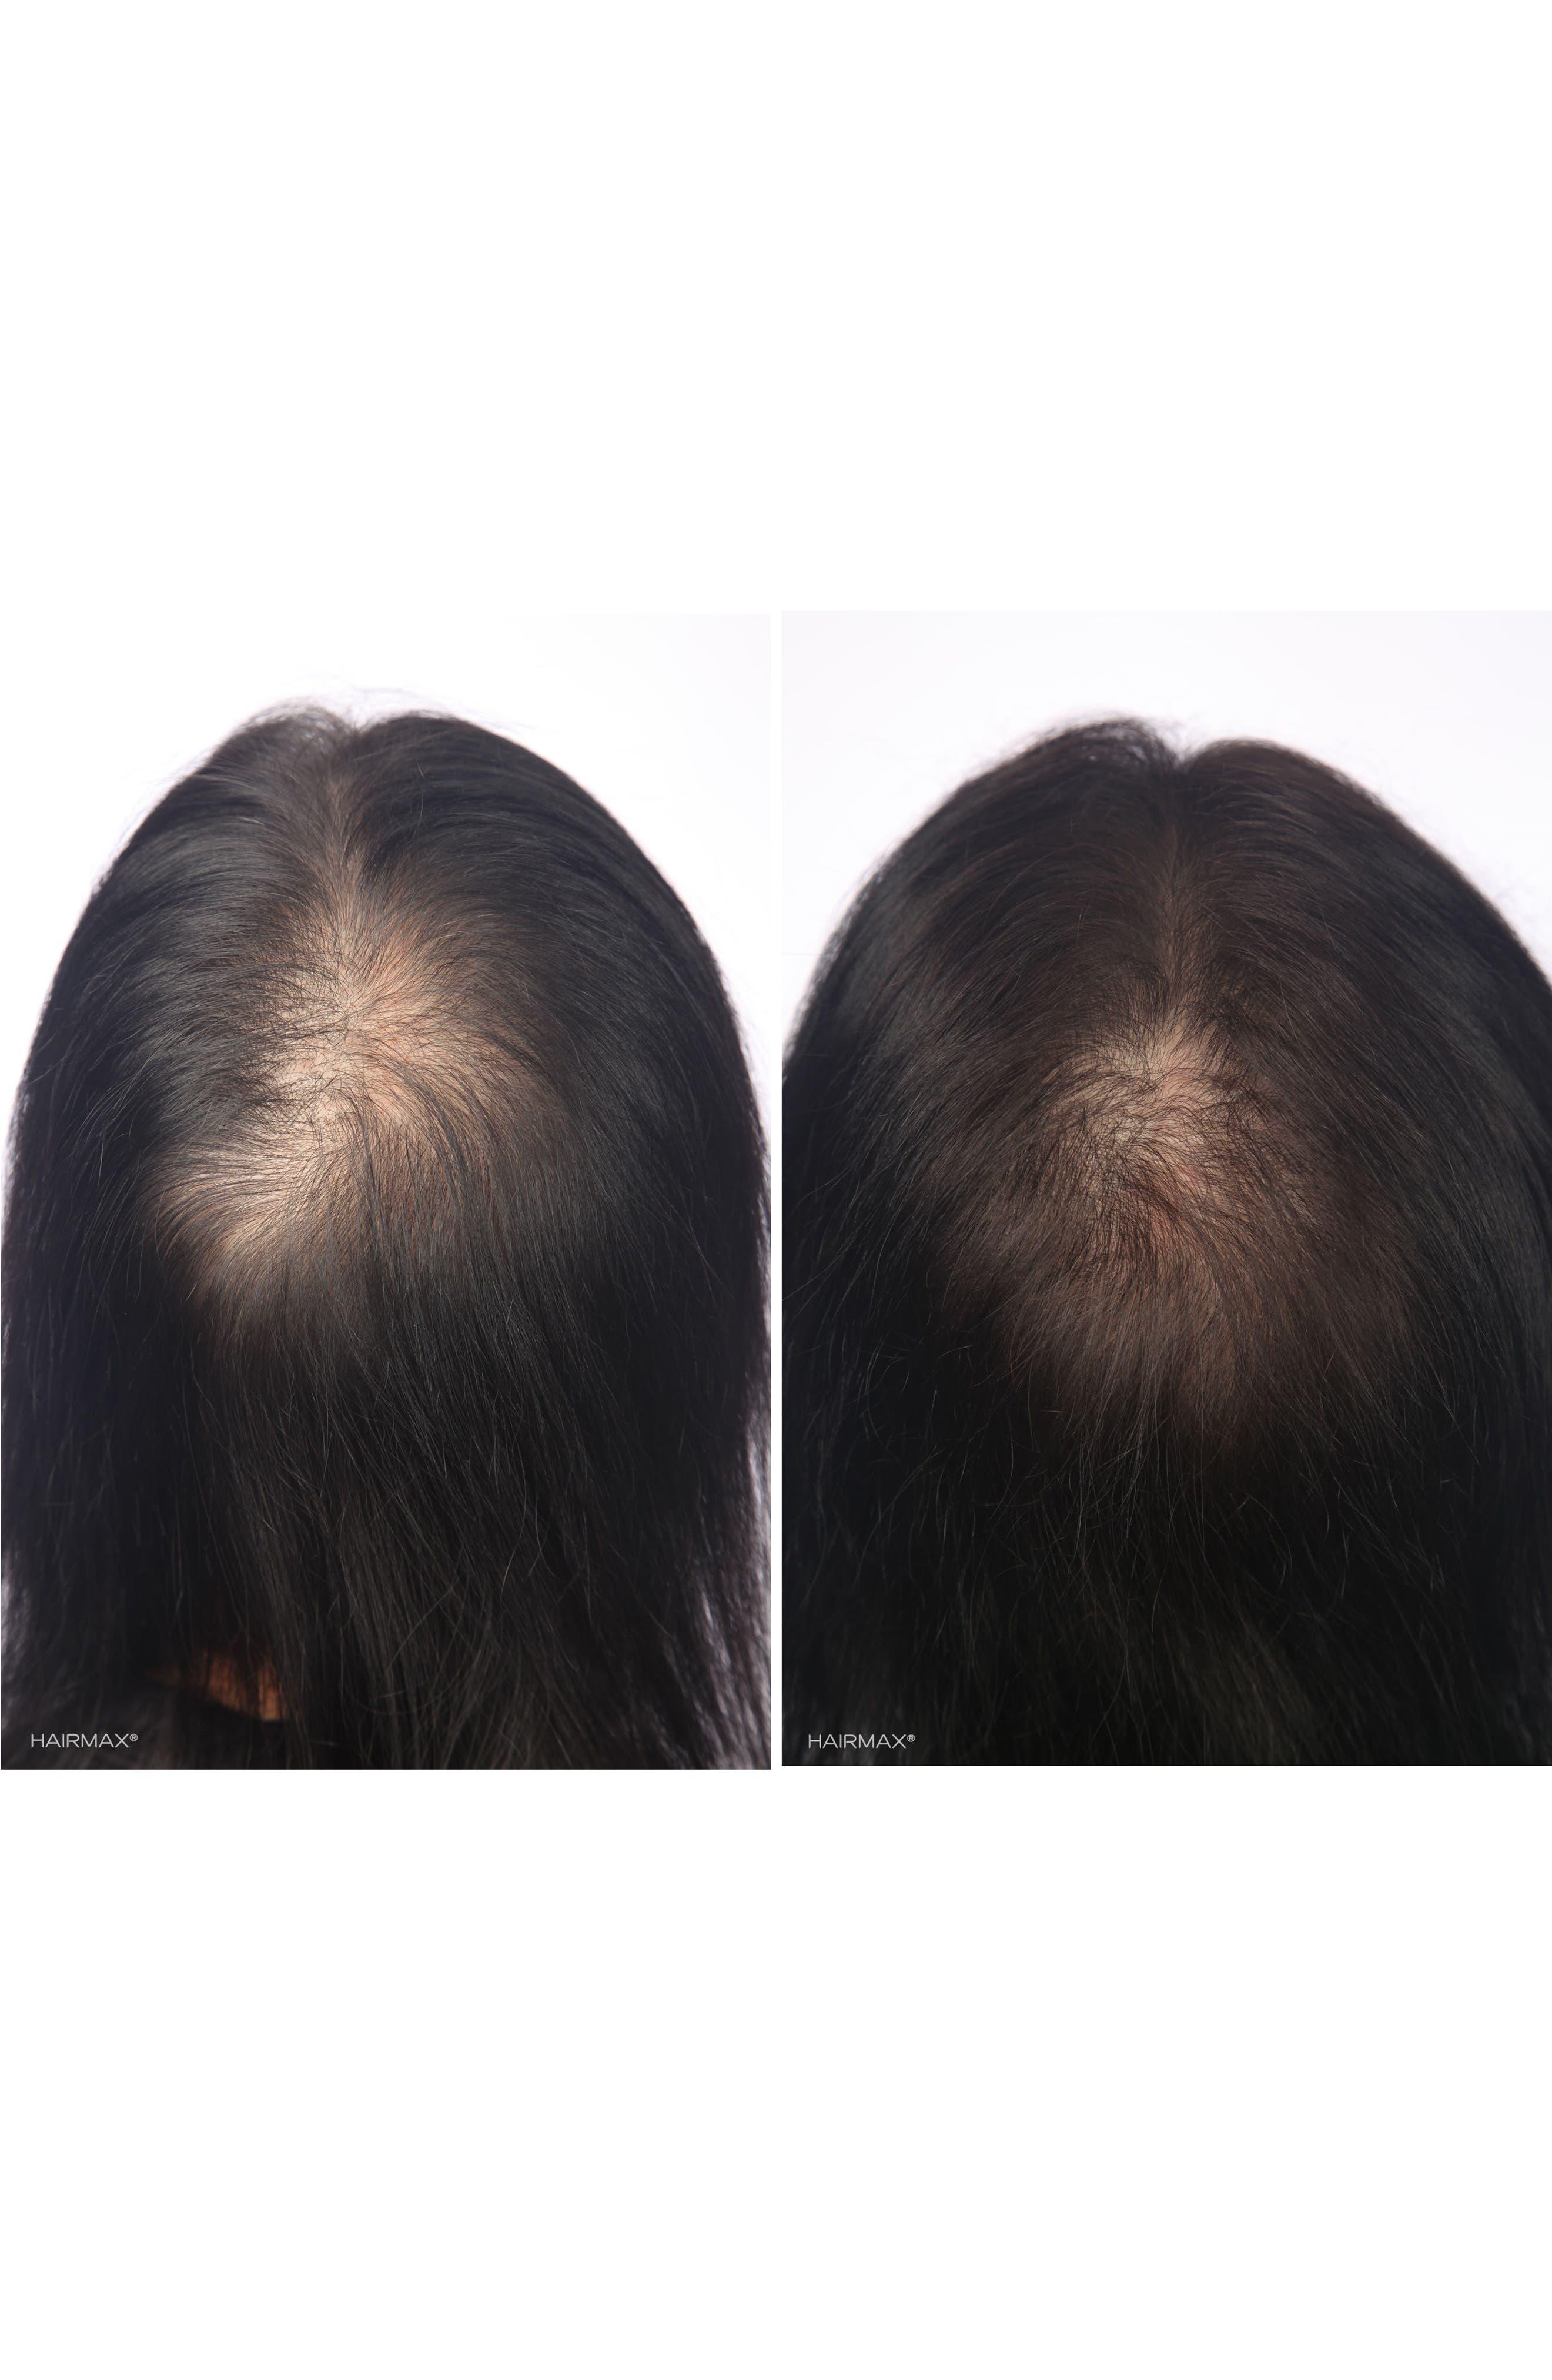 Alternate Image 4  - HAIRMAX® 'LaserBand 82' Laser Hair Regrowth System